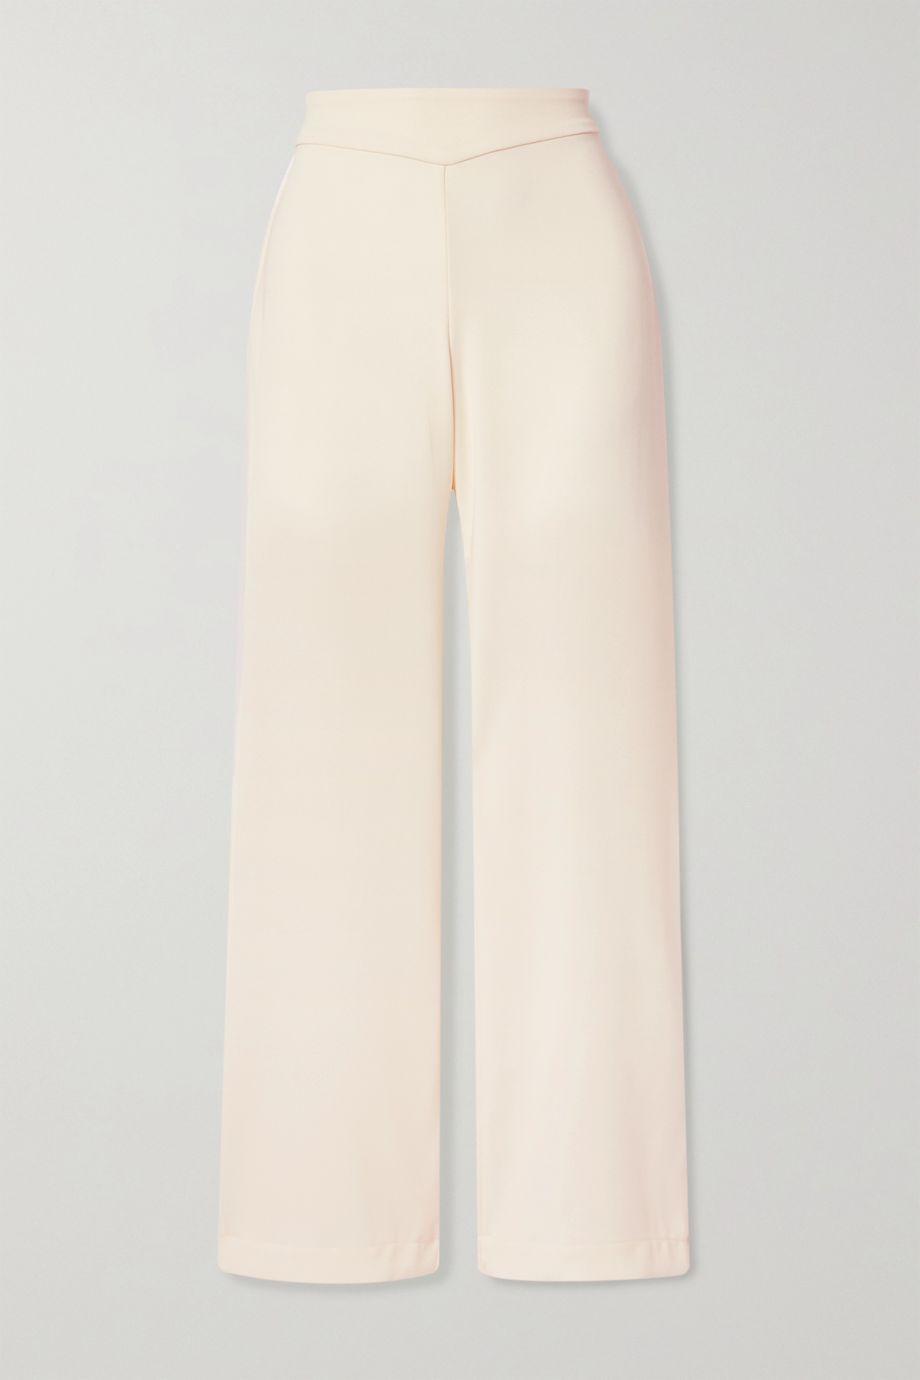 Johanna Ortiz Palpitating crepe flared pants